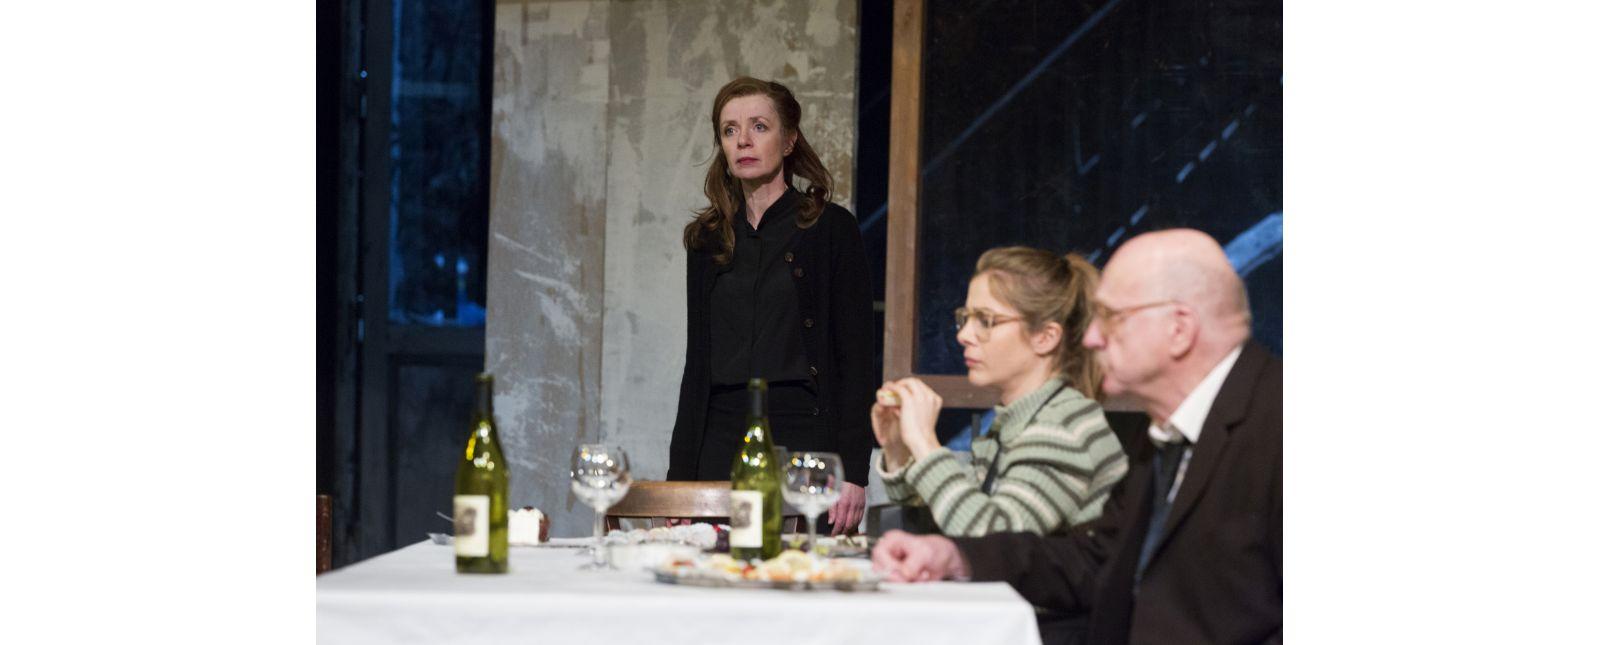 Drei Winter // Anna Stieblich, Angela Falkenhan, Hartmut Stanke // Rainer Muranyi // 2018